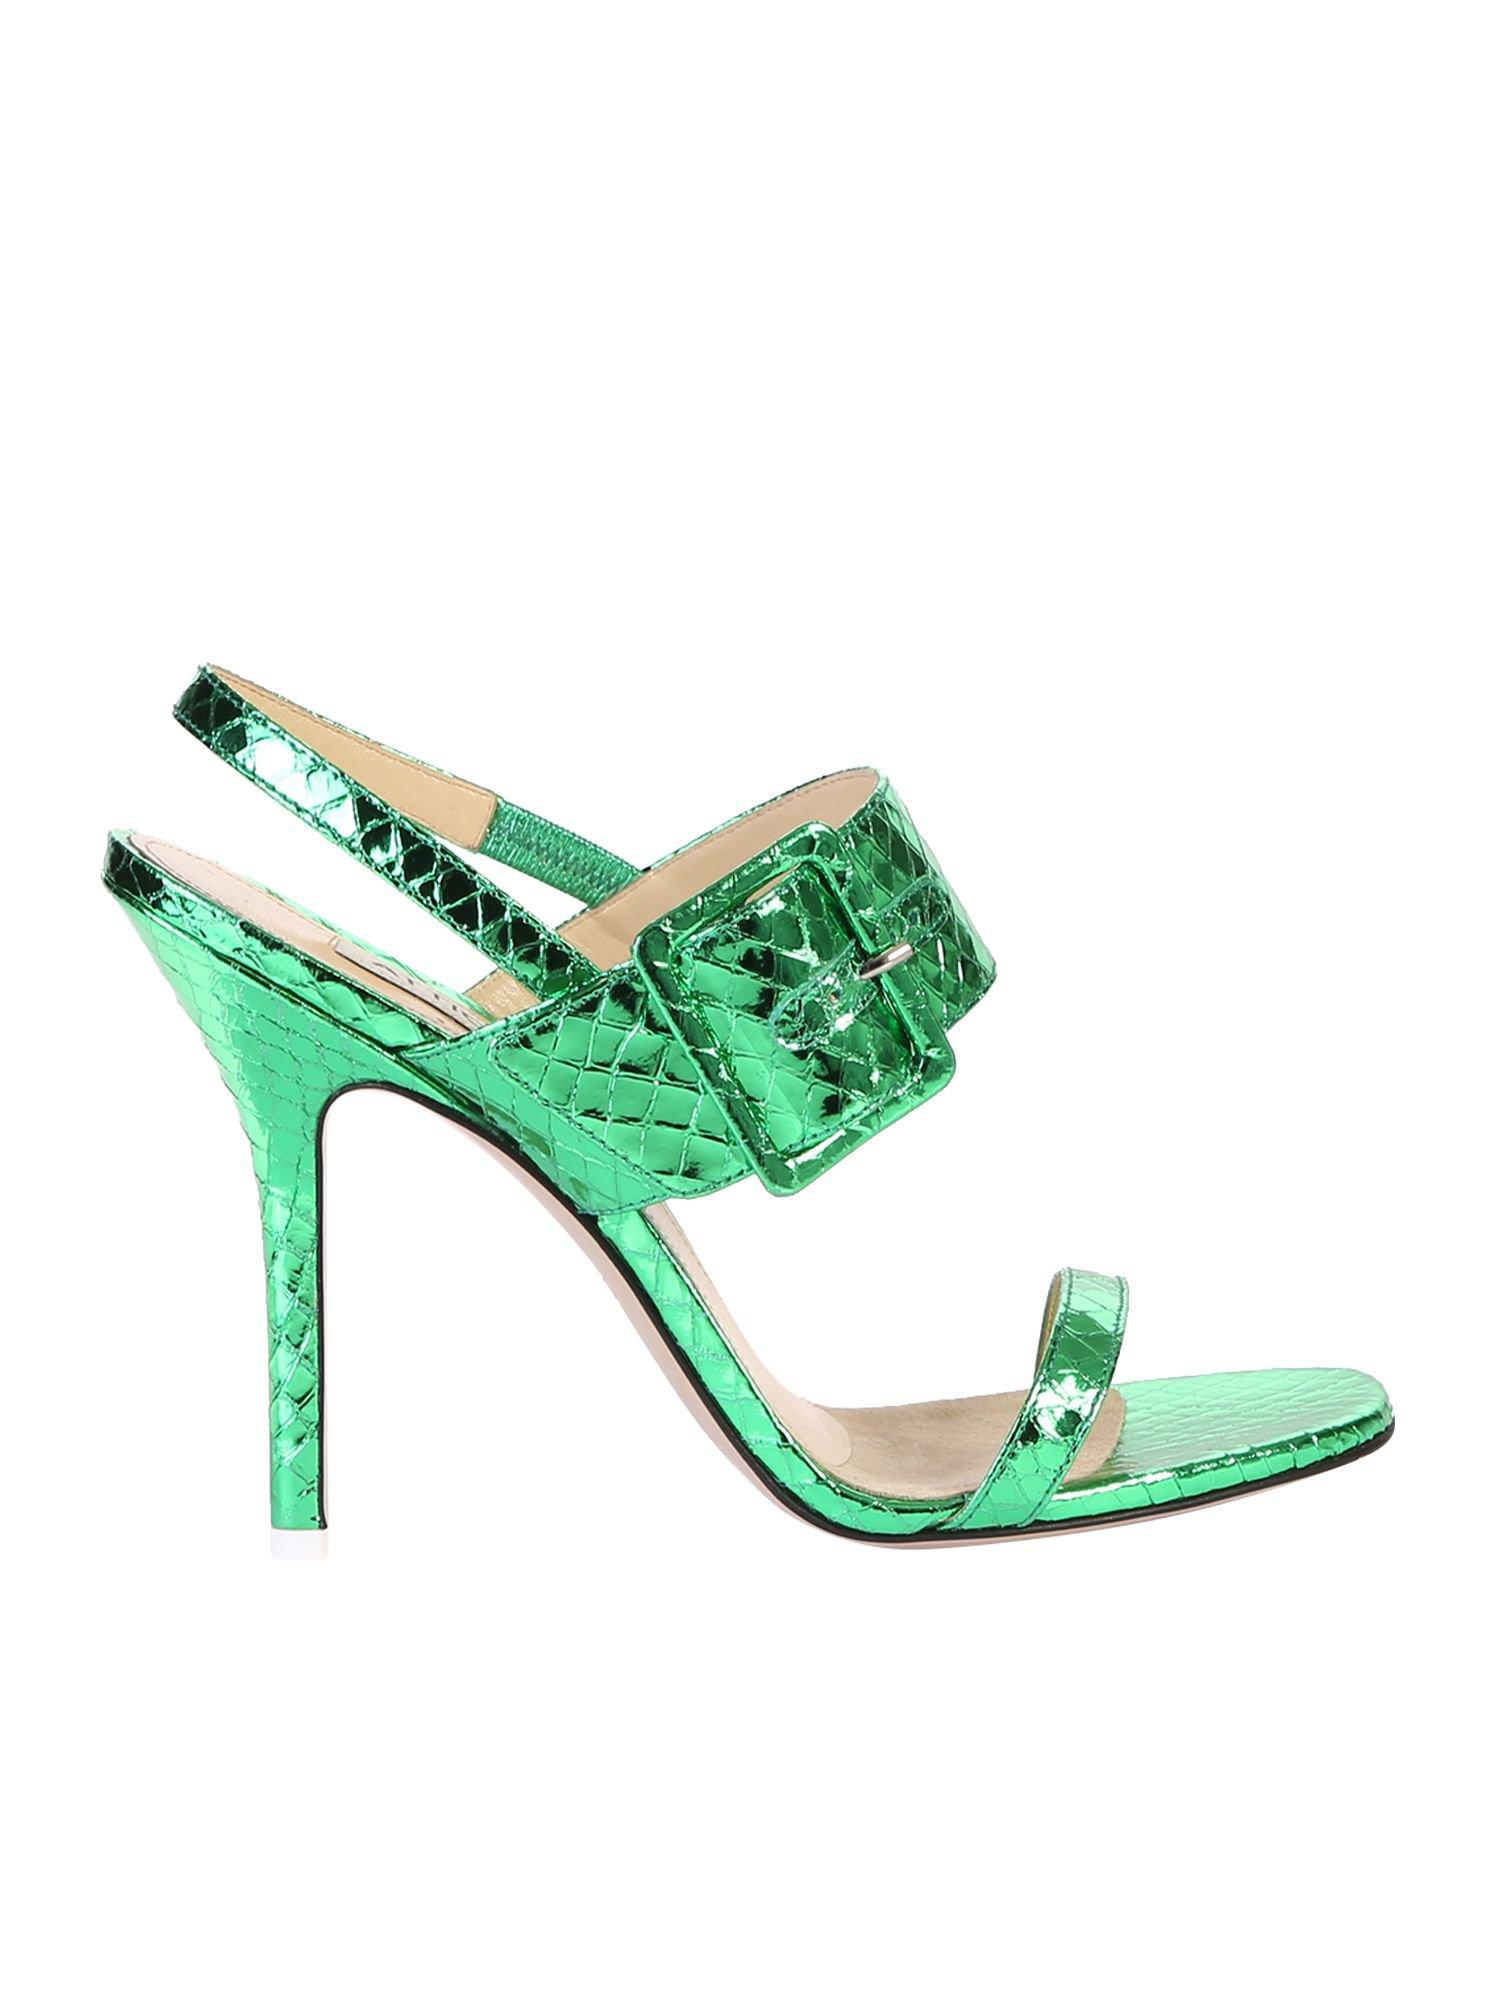 The Attico Snakeskin Print Sandals